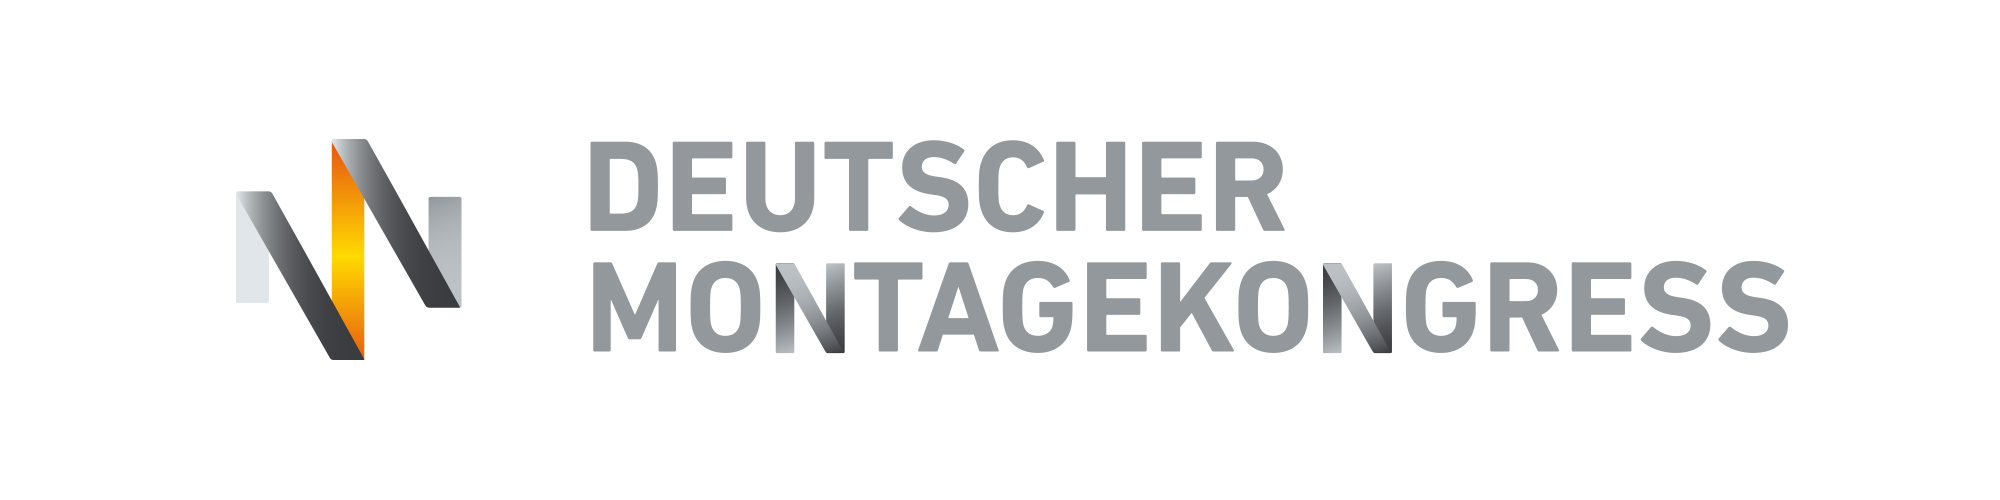 bergstromdesign.de_montage05